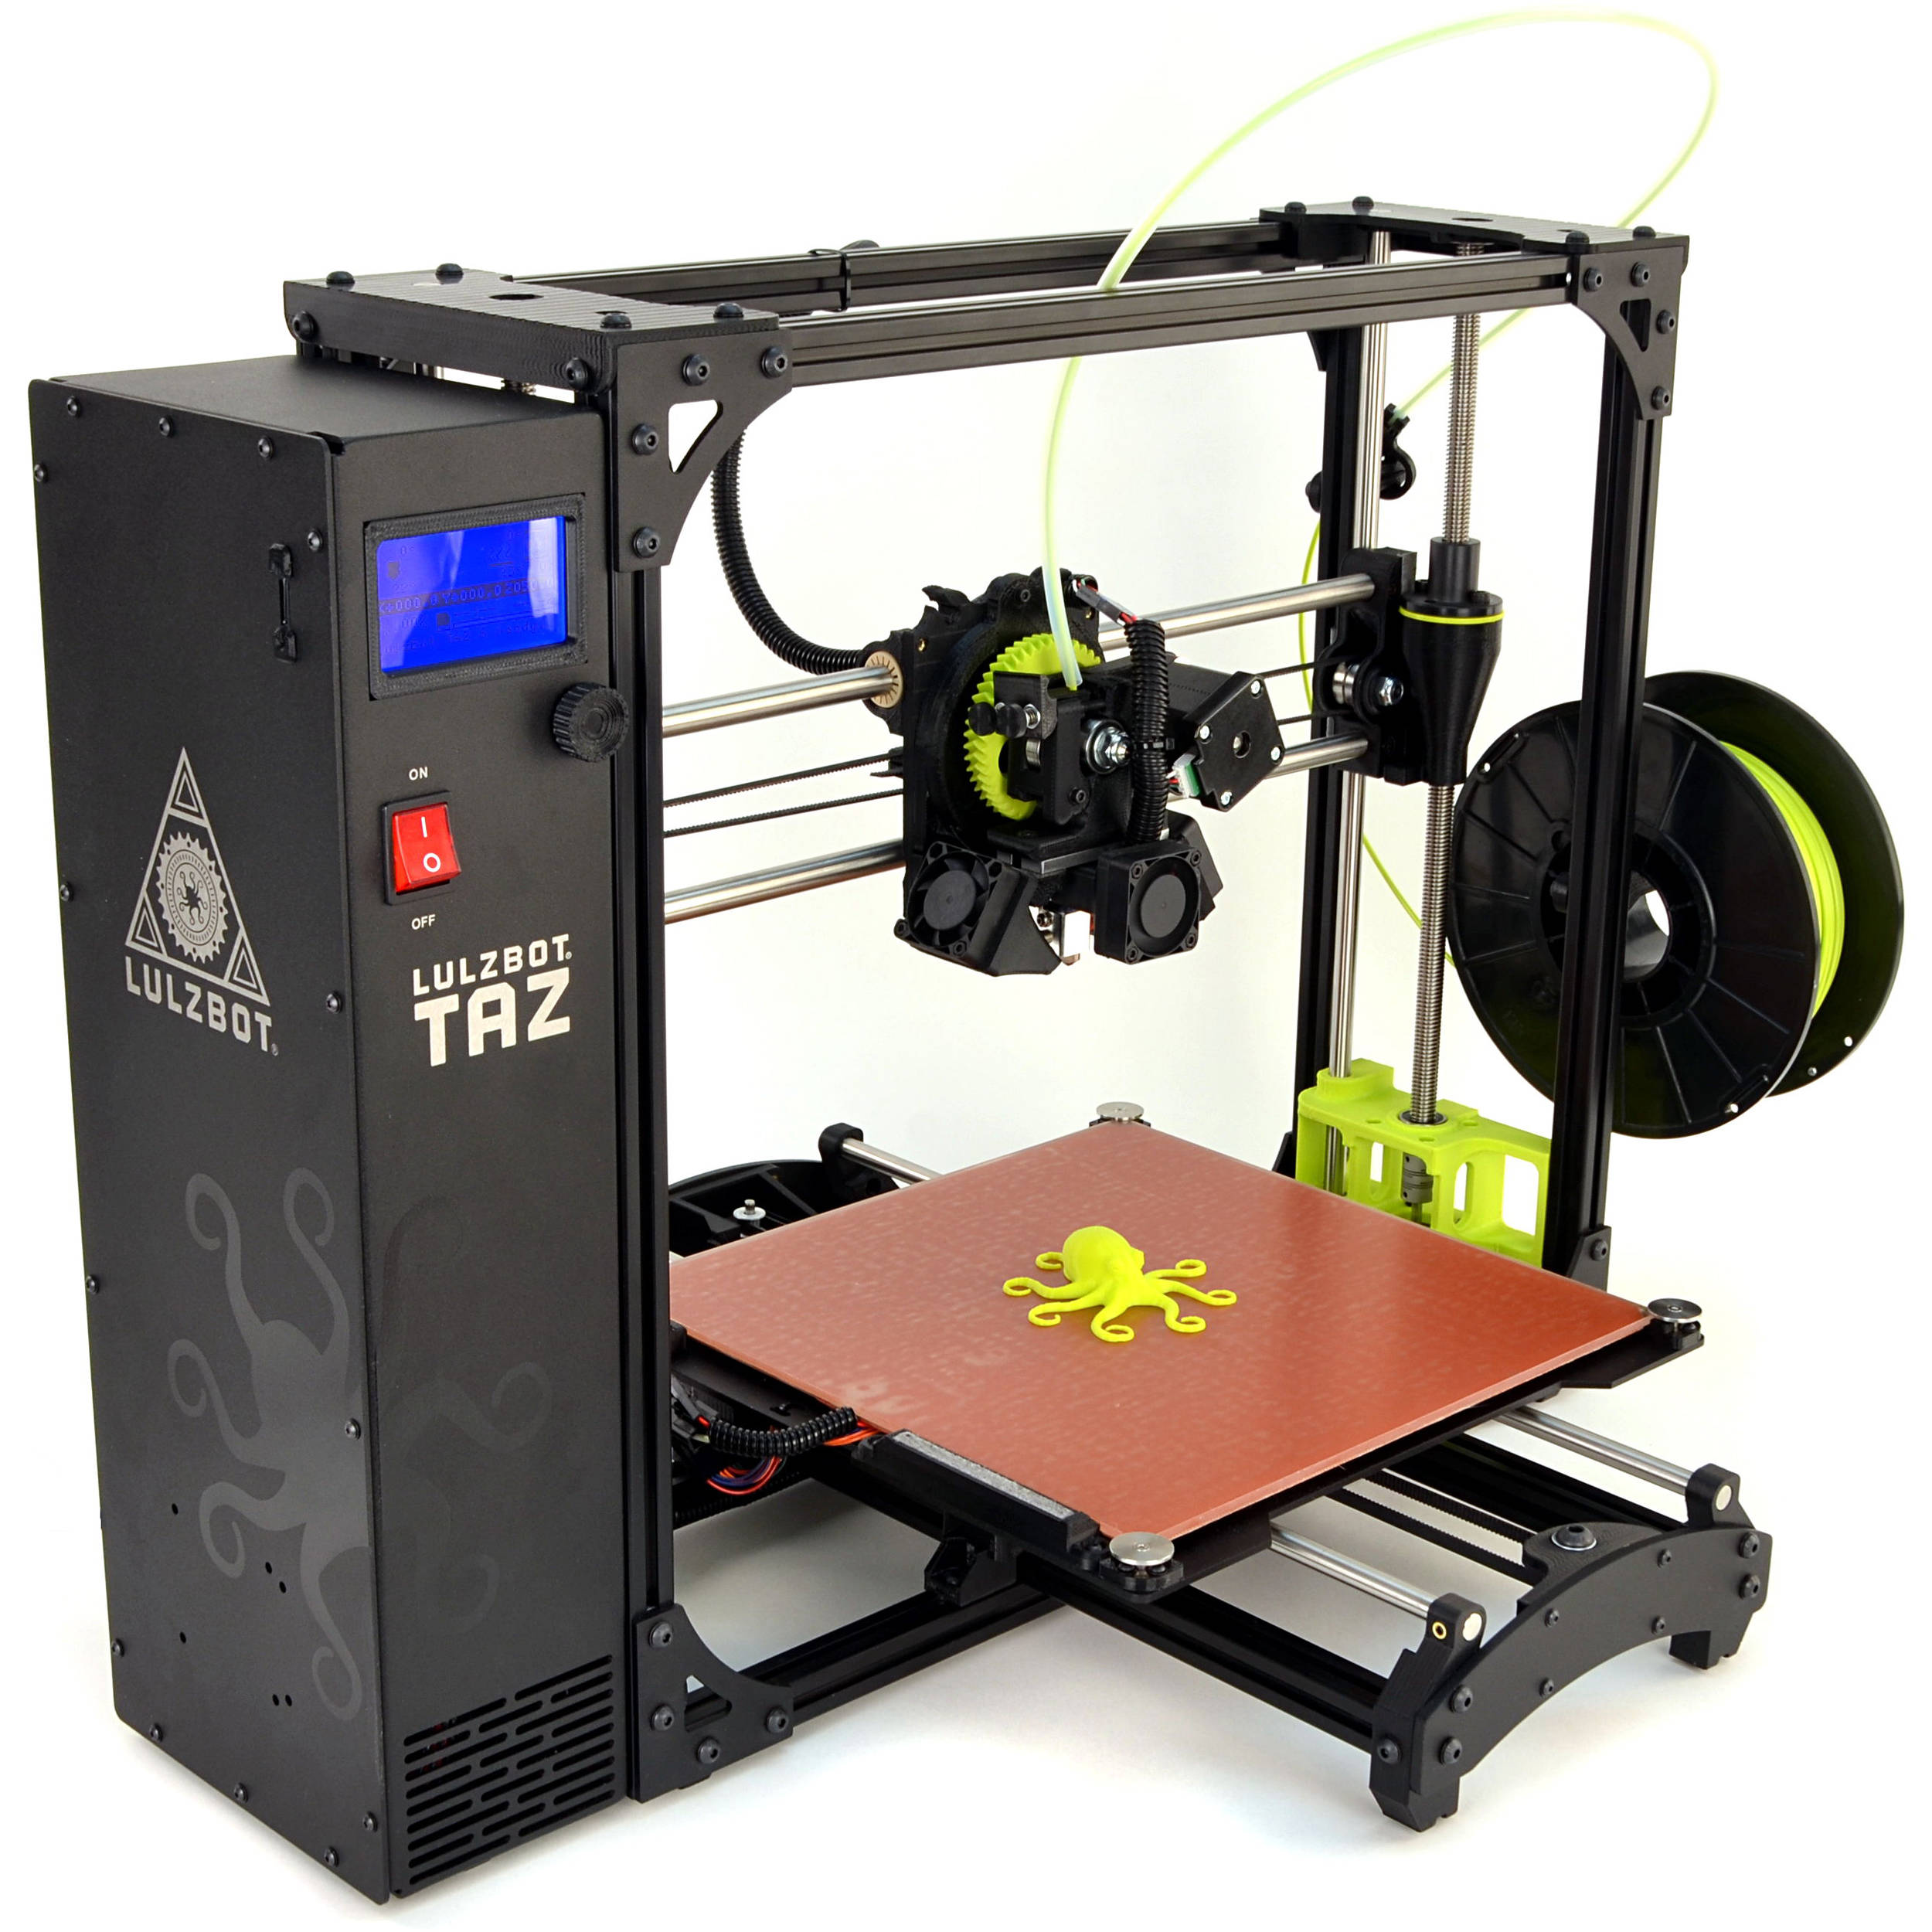 LulzBot TAZ 6 3D Printer KT-PR0041NA B&H Photo Video